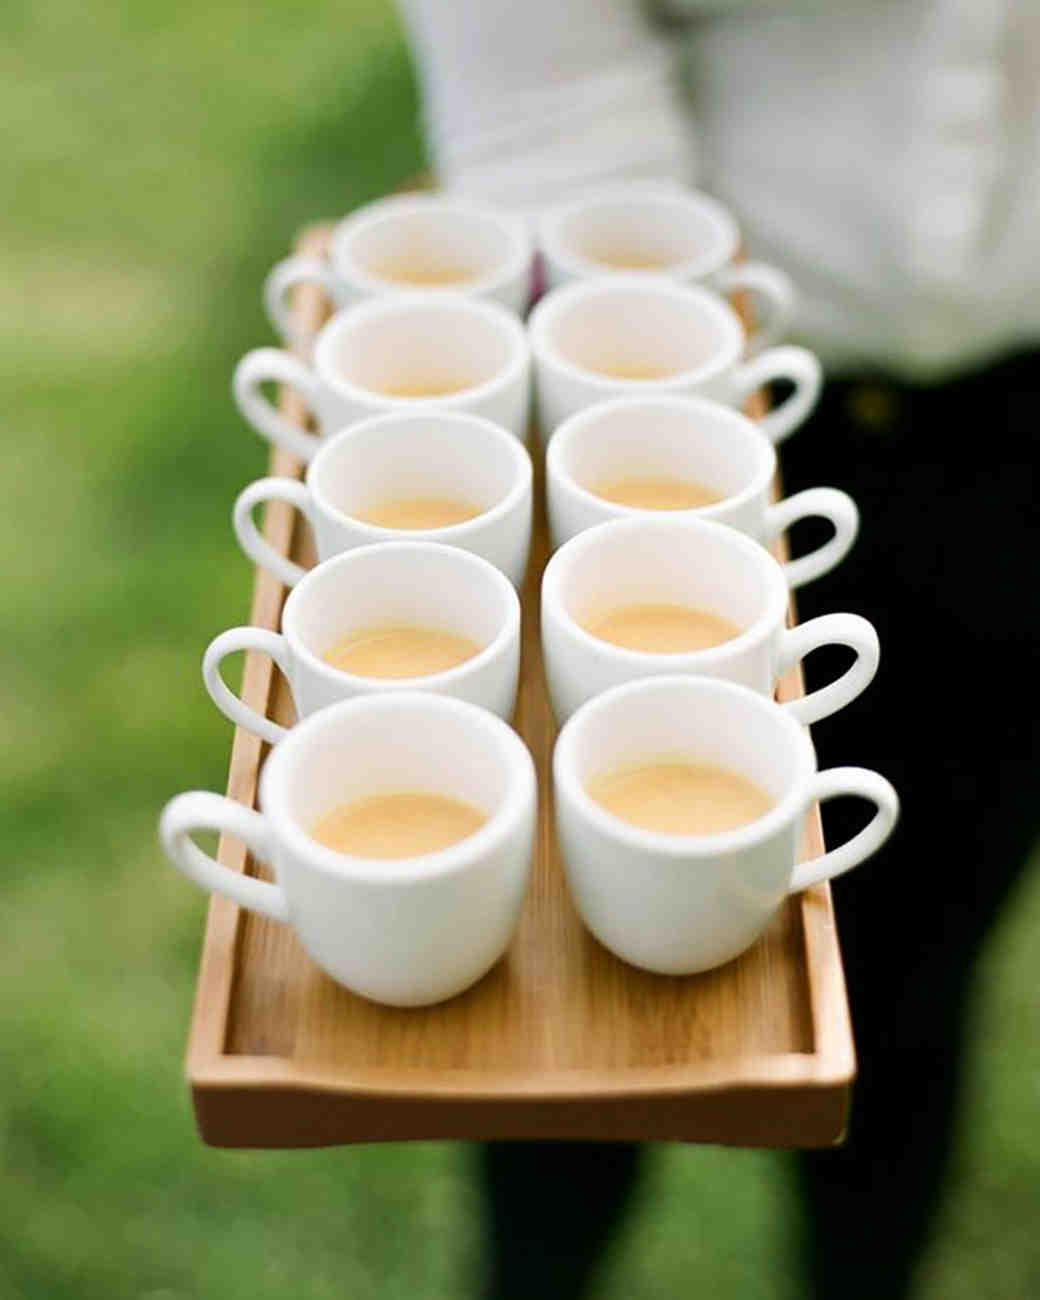 coffee wedding ideas tray of small white coffee mugs